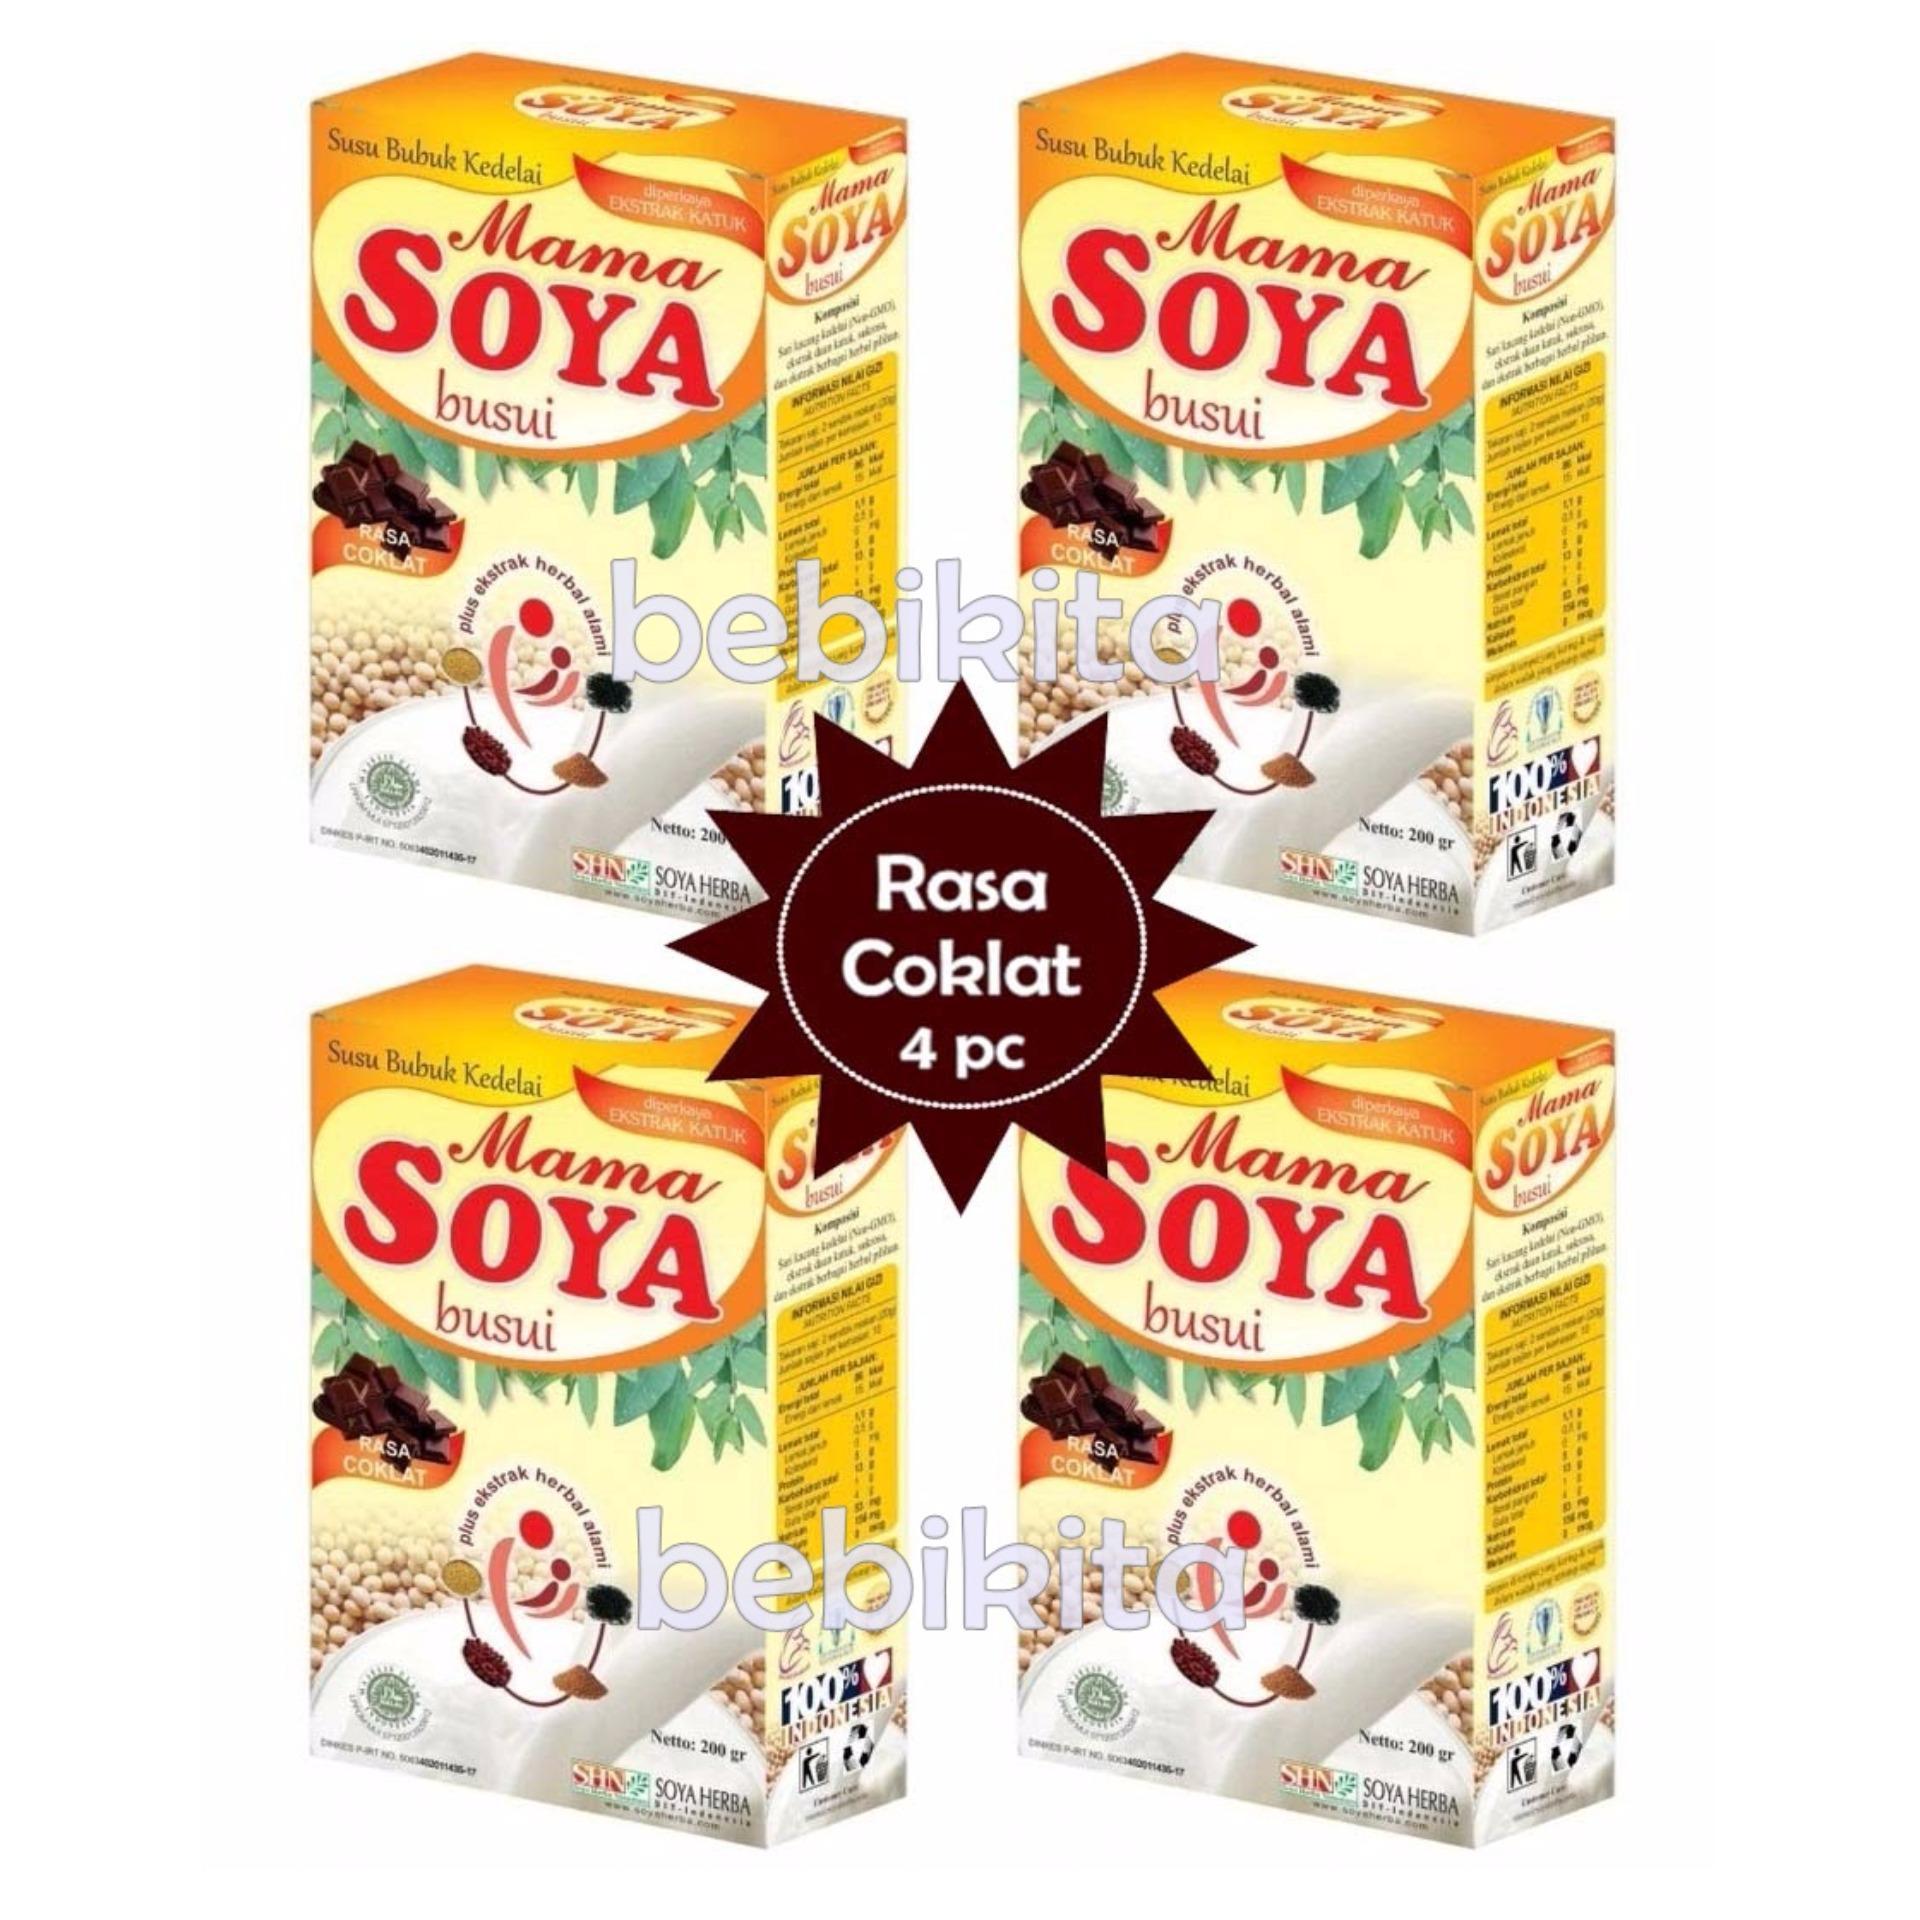 Spesifikasi Mama Soya Susu Pelancar Asi Booster Rasa Coklat 200 Gr 4 Pcs Yang Bagus